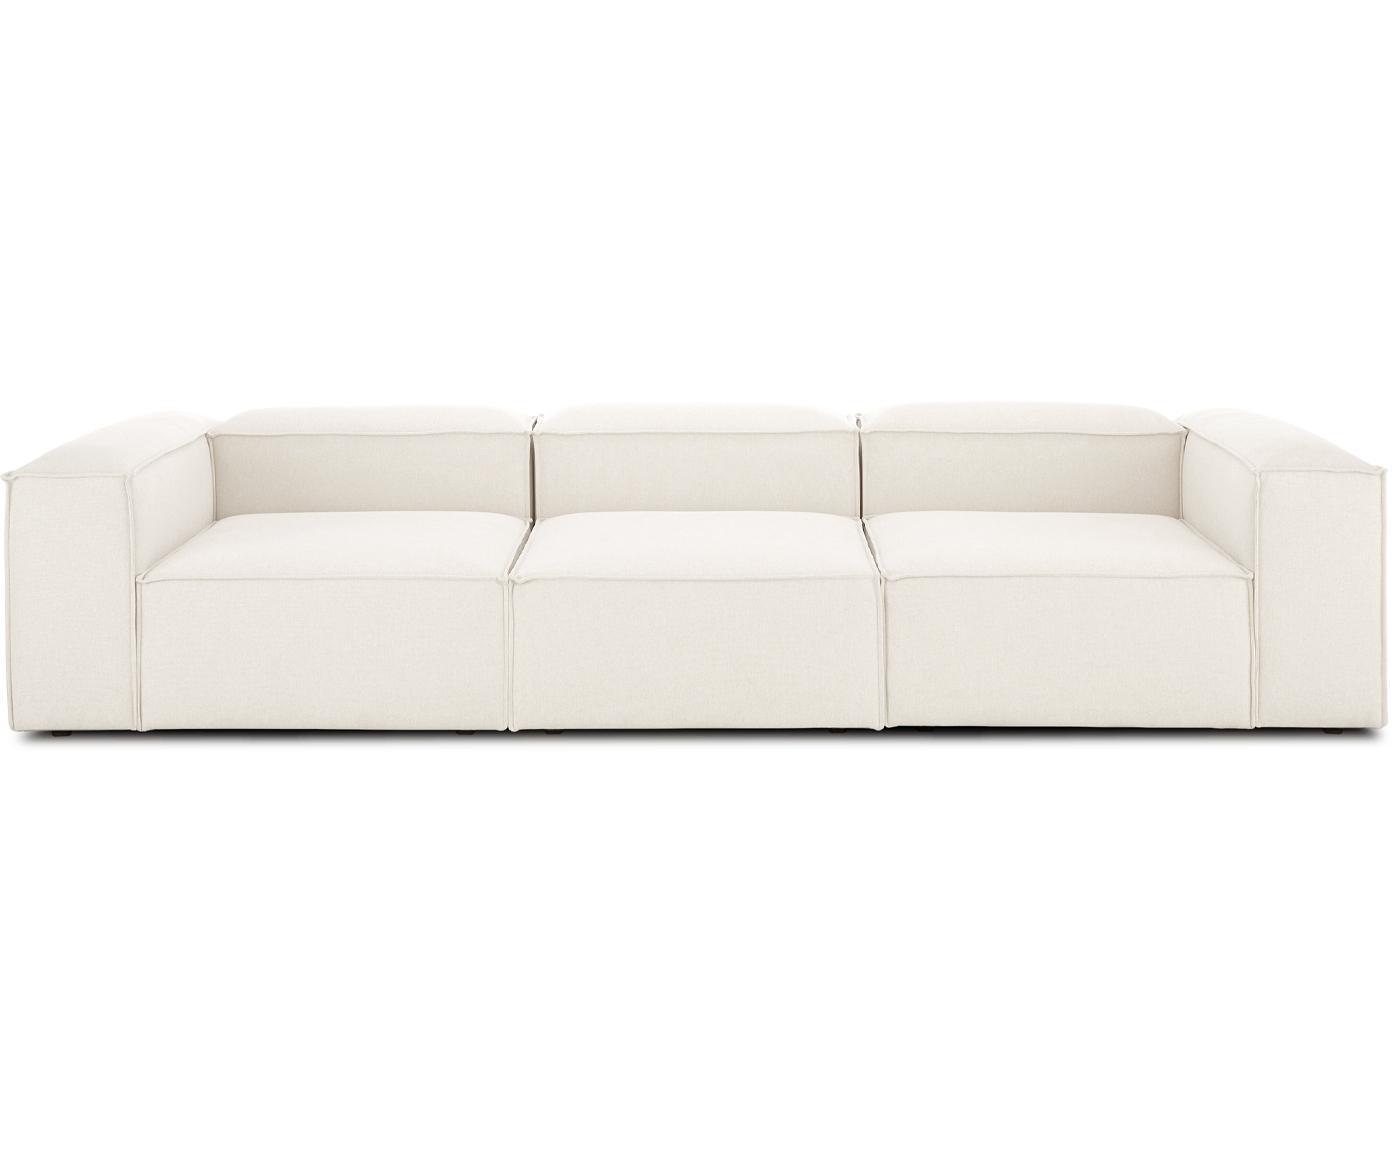 Modulares Sofa Lennon (4-Sitzer), Bezug: Polyester 35.000 Scheuert, Gestell: Massives Kiefernholz, Spe, Webstoff Beige, B 326 x T 119 cm